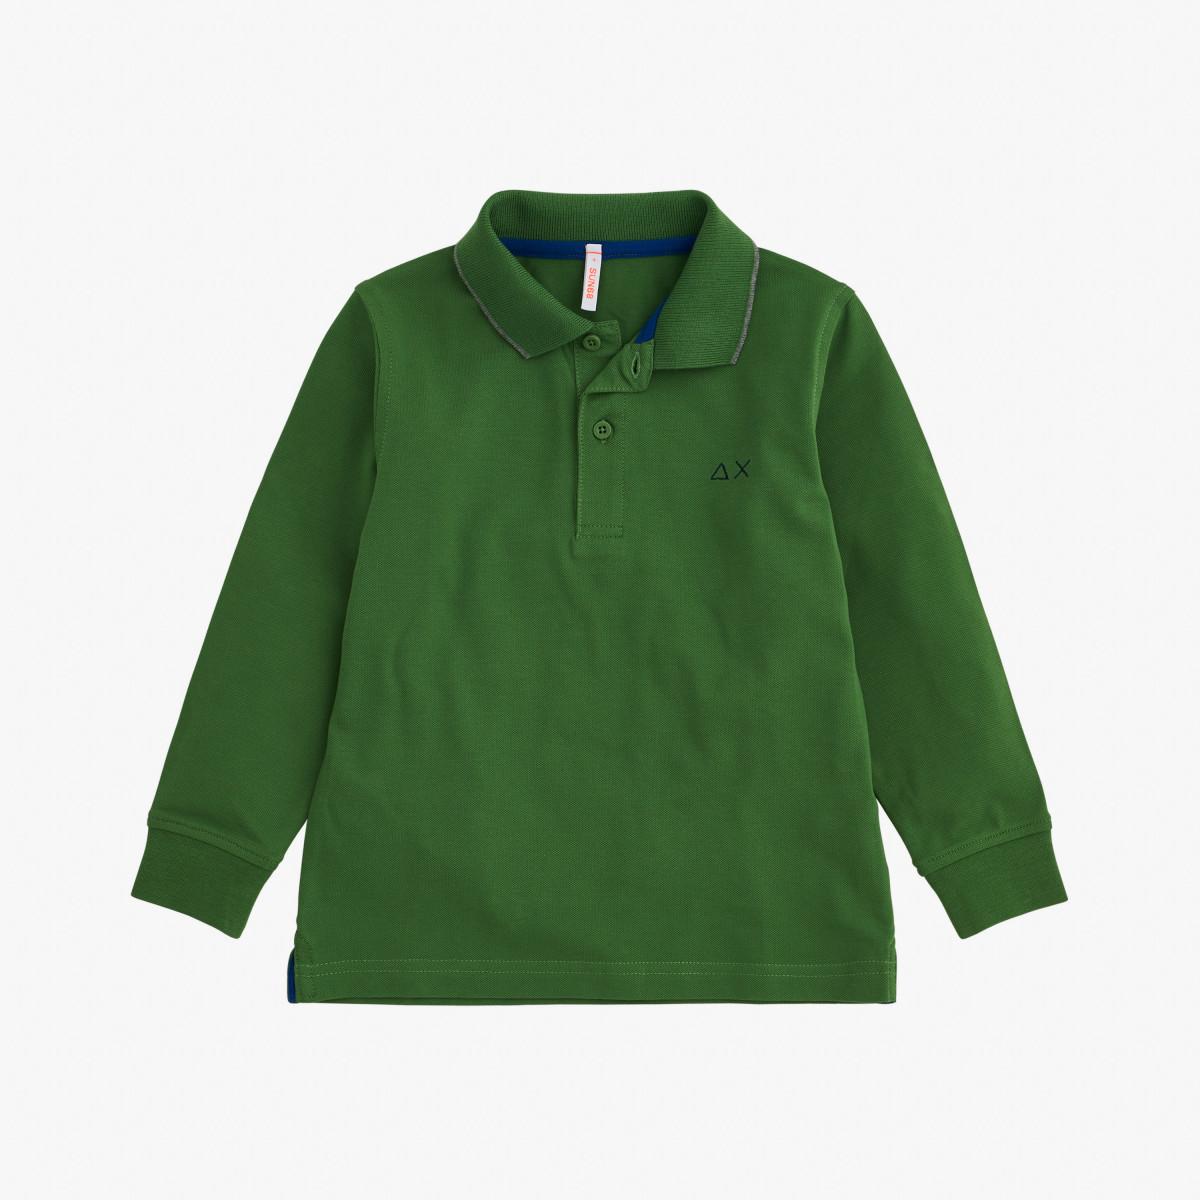 BOY'S POLO SMALL STRIPES L/S BOTTLE GREEN